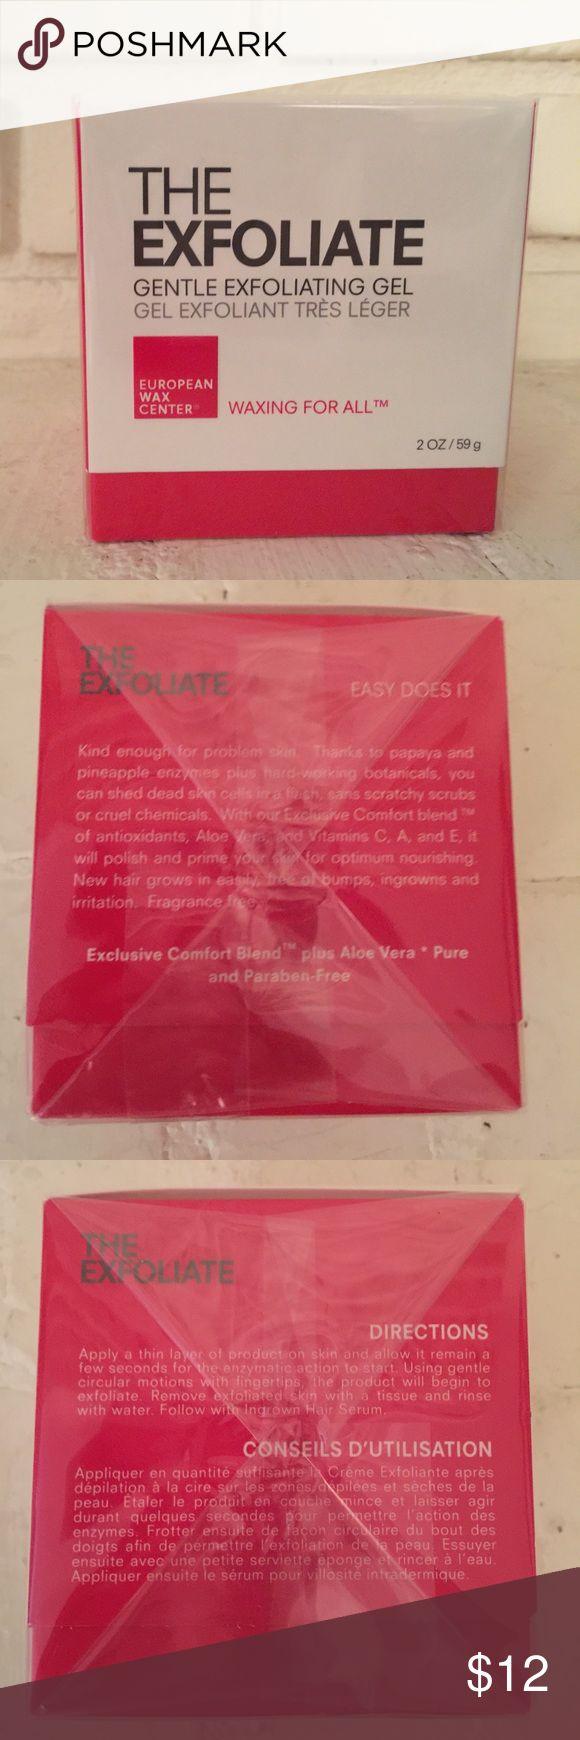 New Sealed European Wax Center The Exfoliate Nwt